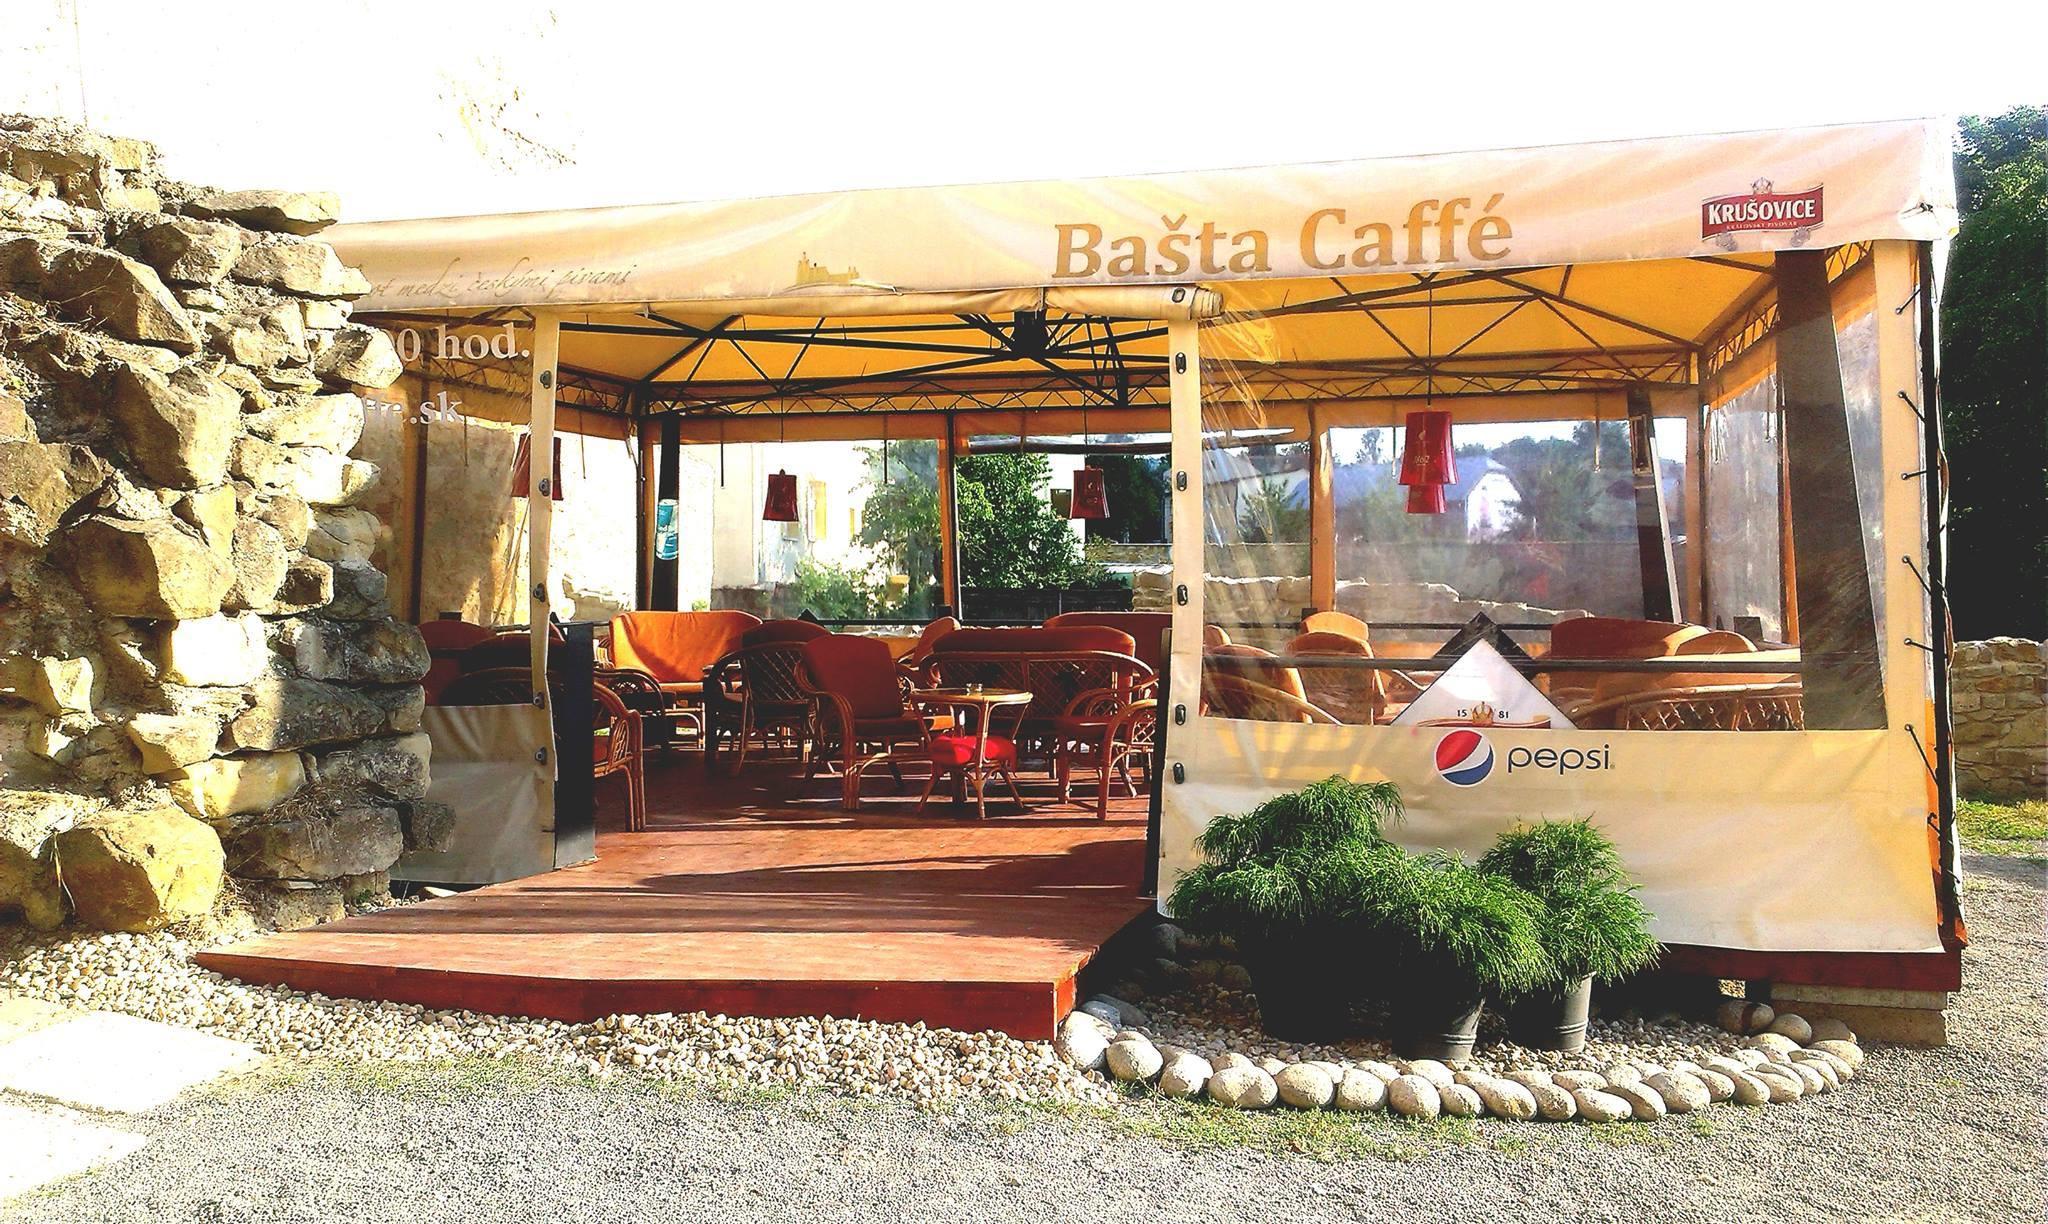 Bašta Caffé